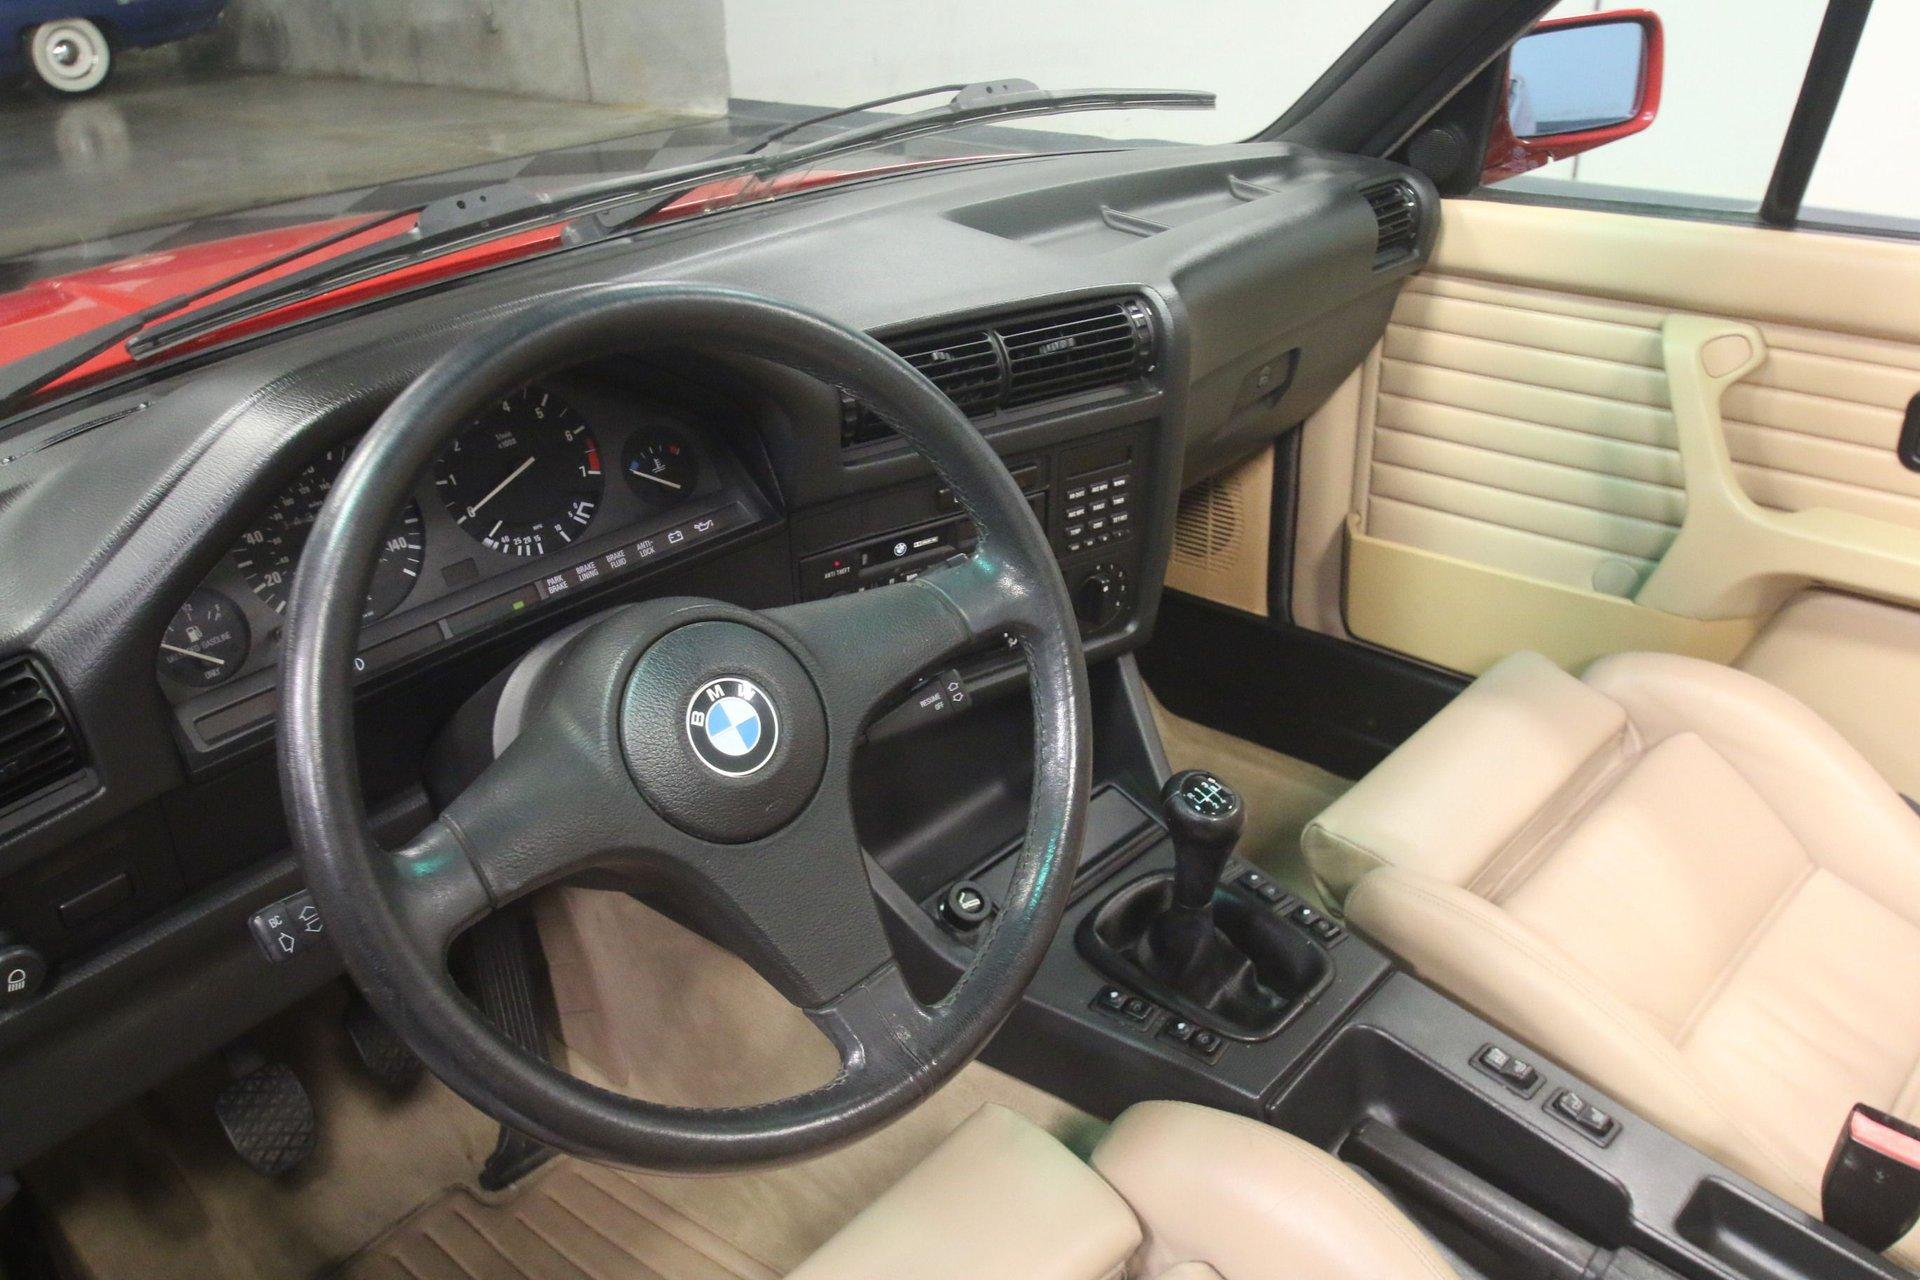 1989 BMW 325i | Streetside Classics - The Nation's Trusted